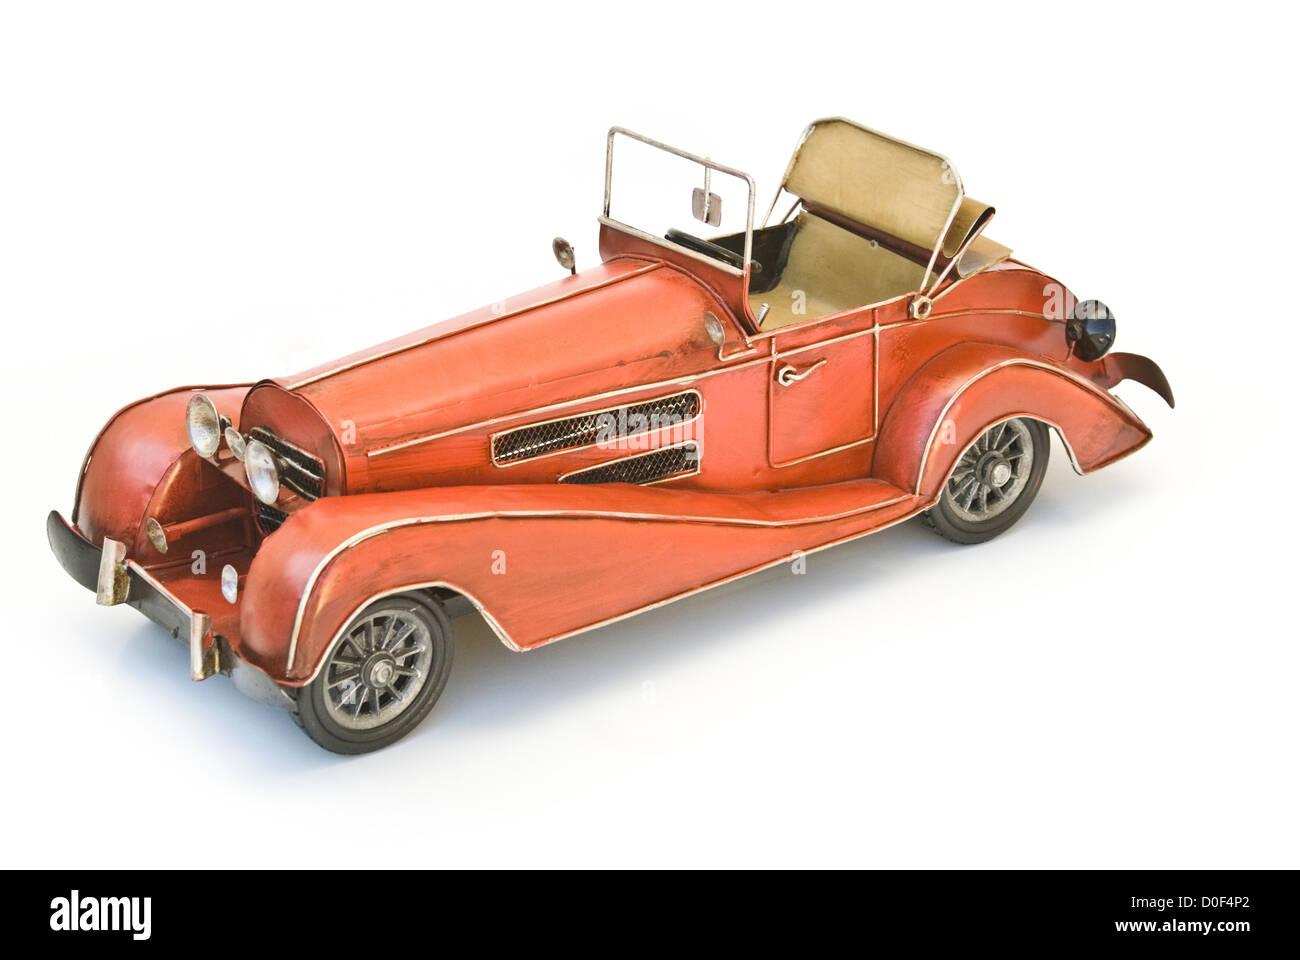 red oldtimer model - Stock Image